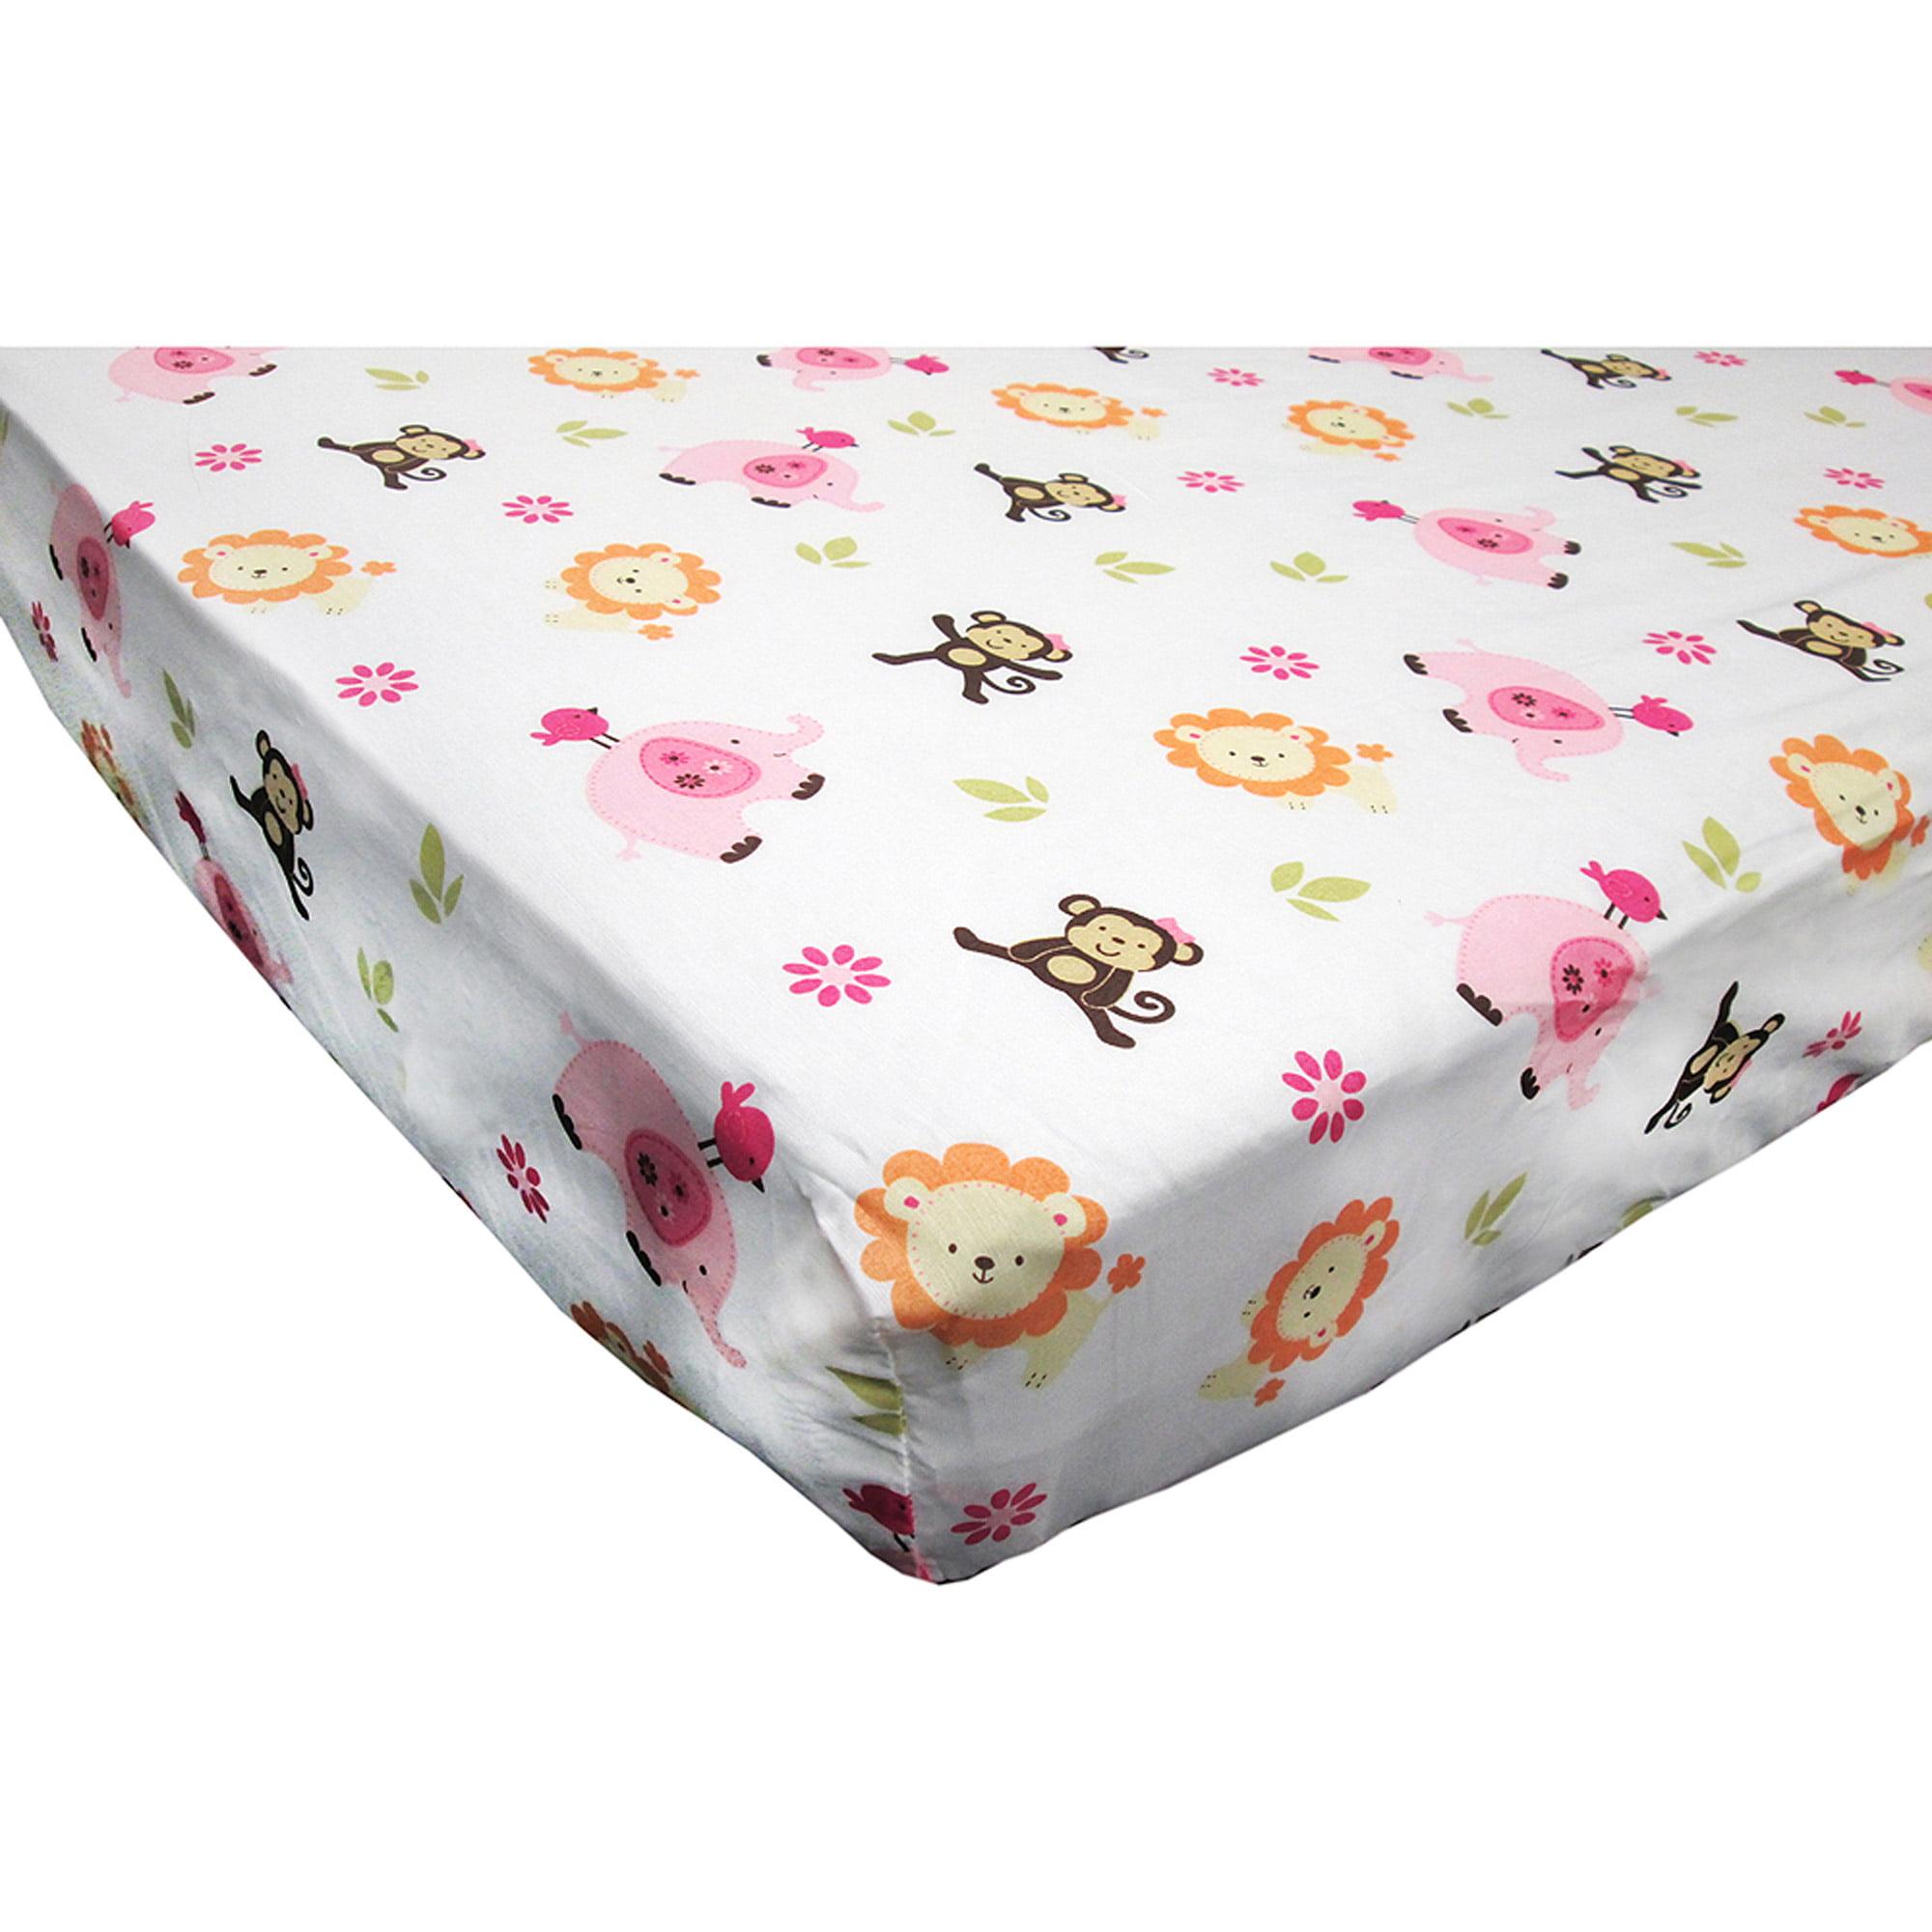 Little Bedding by NoJo Raspberry Jungle Crib Sheet